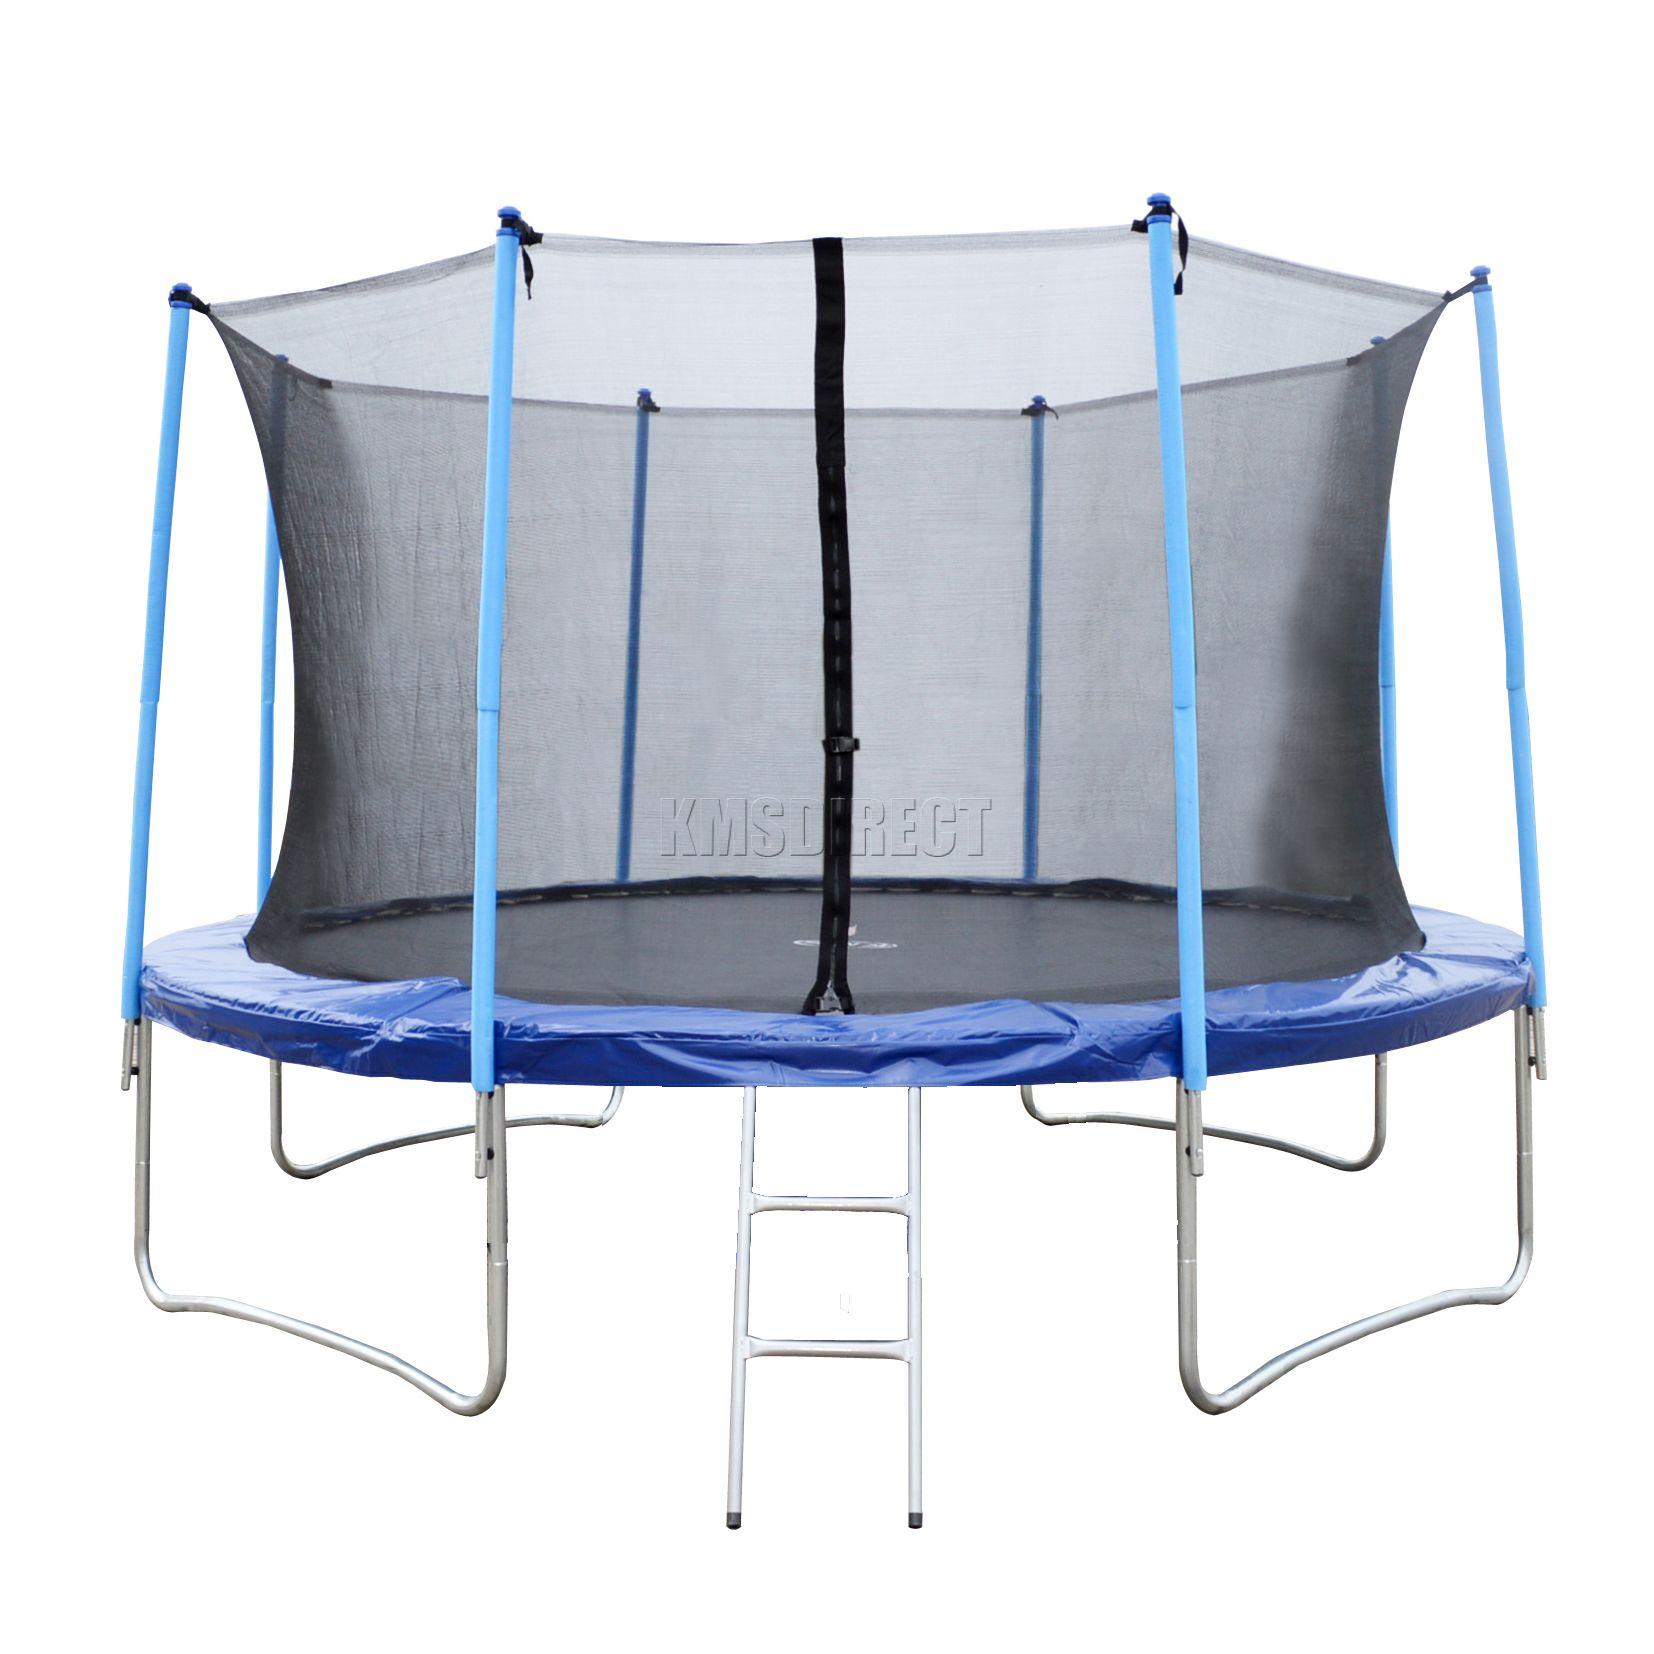 14ft Trampoline With Net Enclosure Ladder Cover 14 Ft Ebay